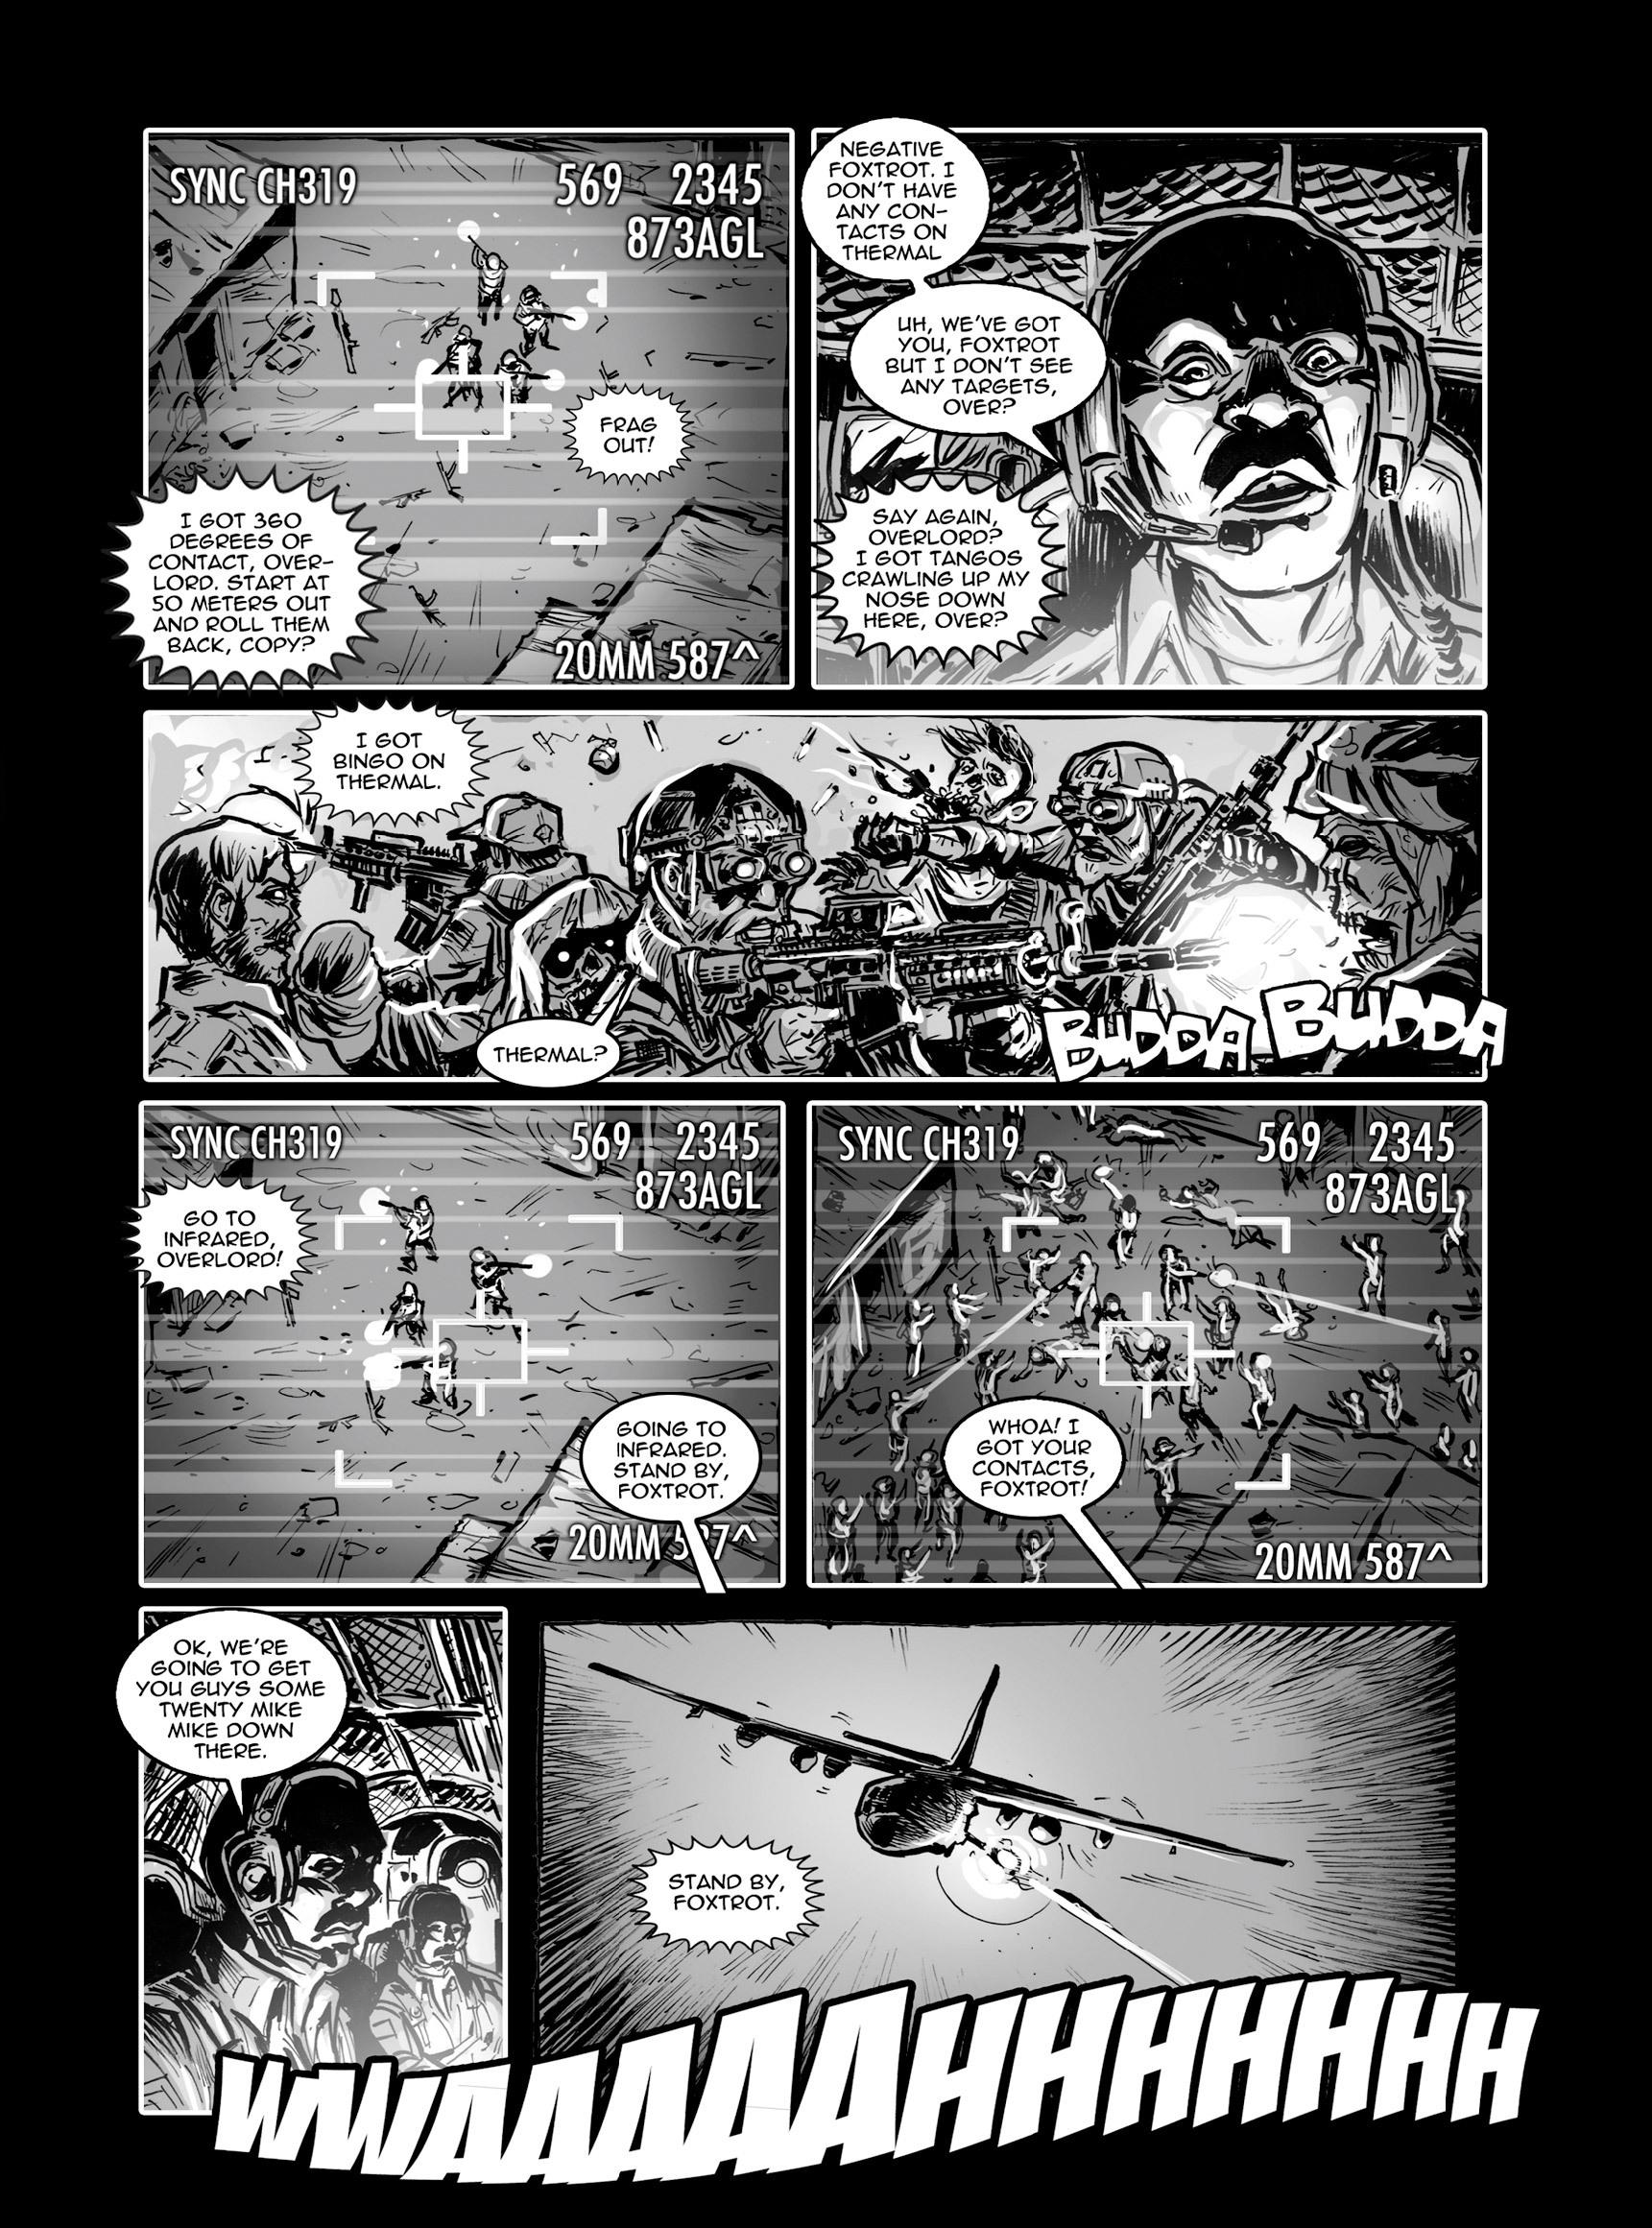 Read online FUBAR comic -  Issue #3 - 371